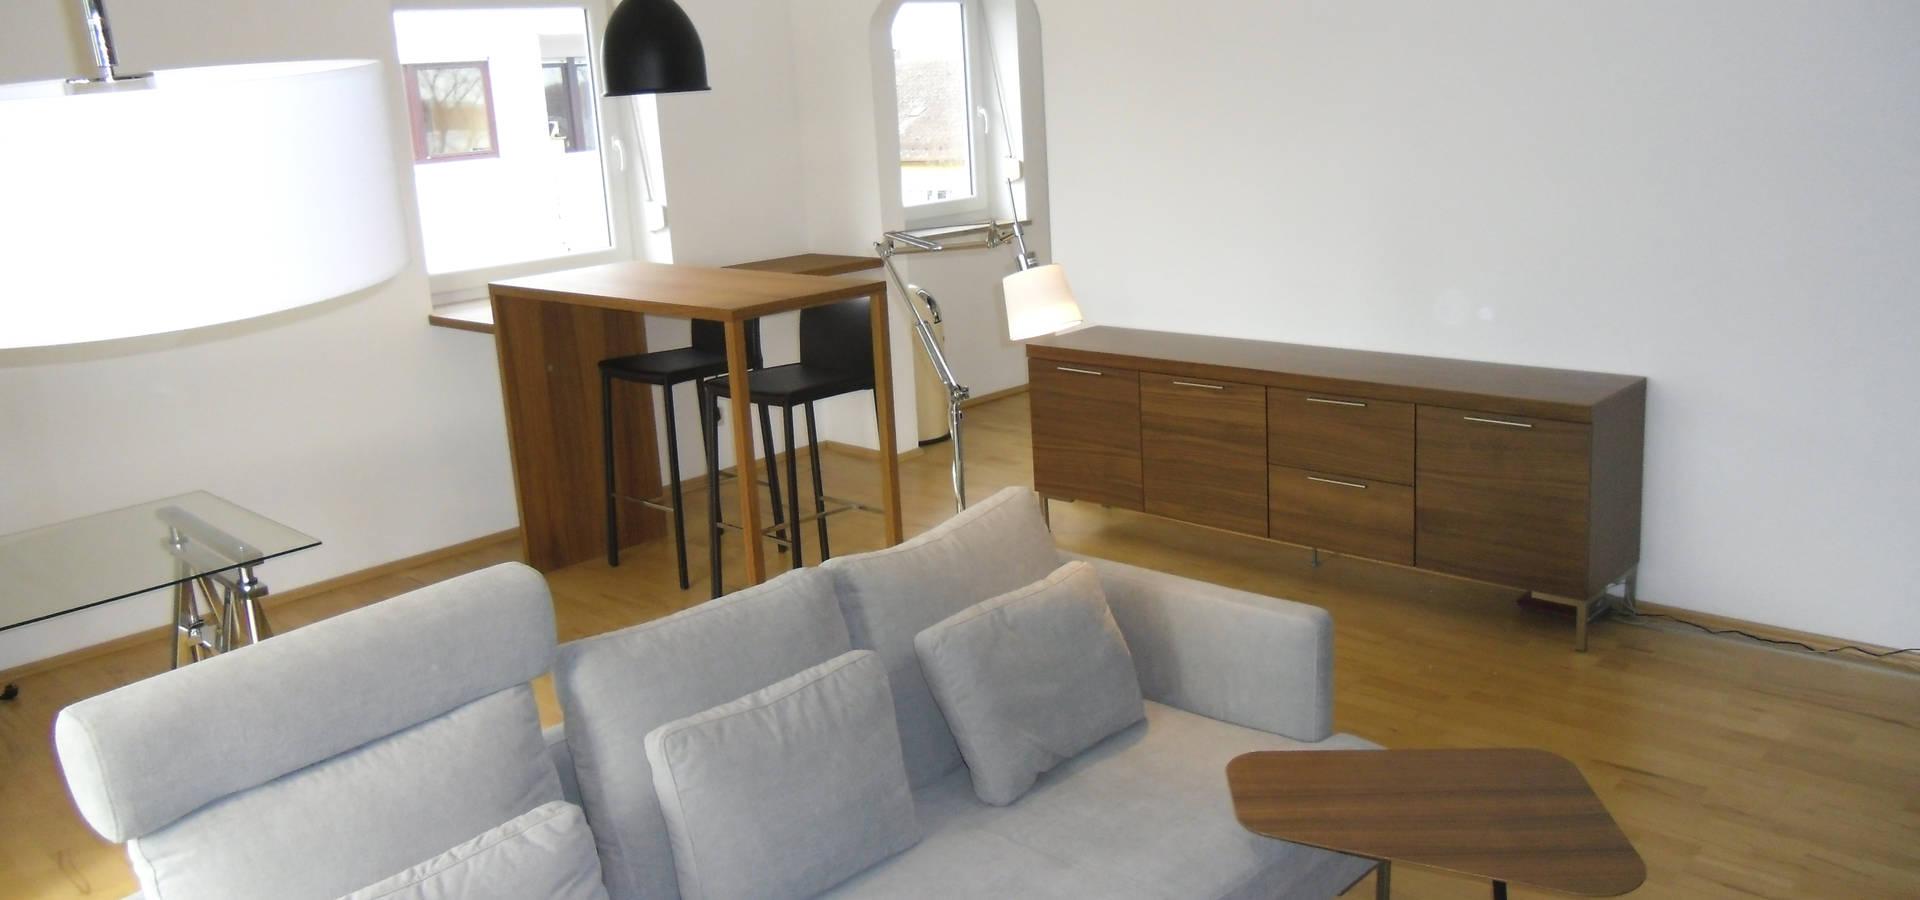 innenarchitektur moll innenarchitekten in augsburg homify. Black Bedroom Furniture Sets. Home Design Ideas